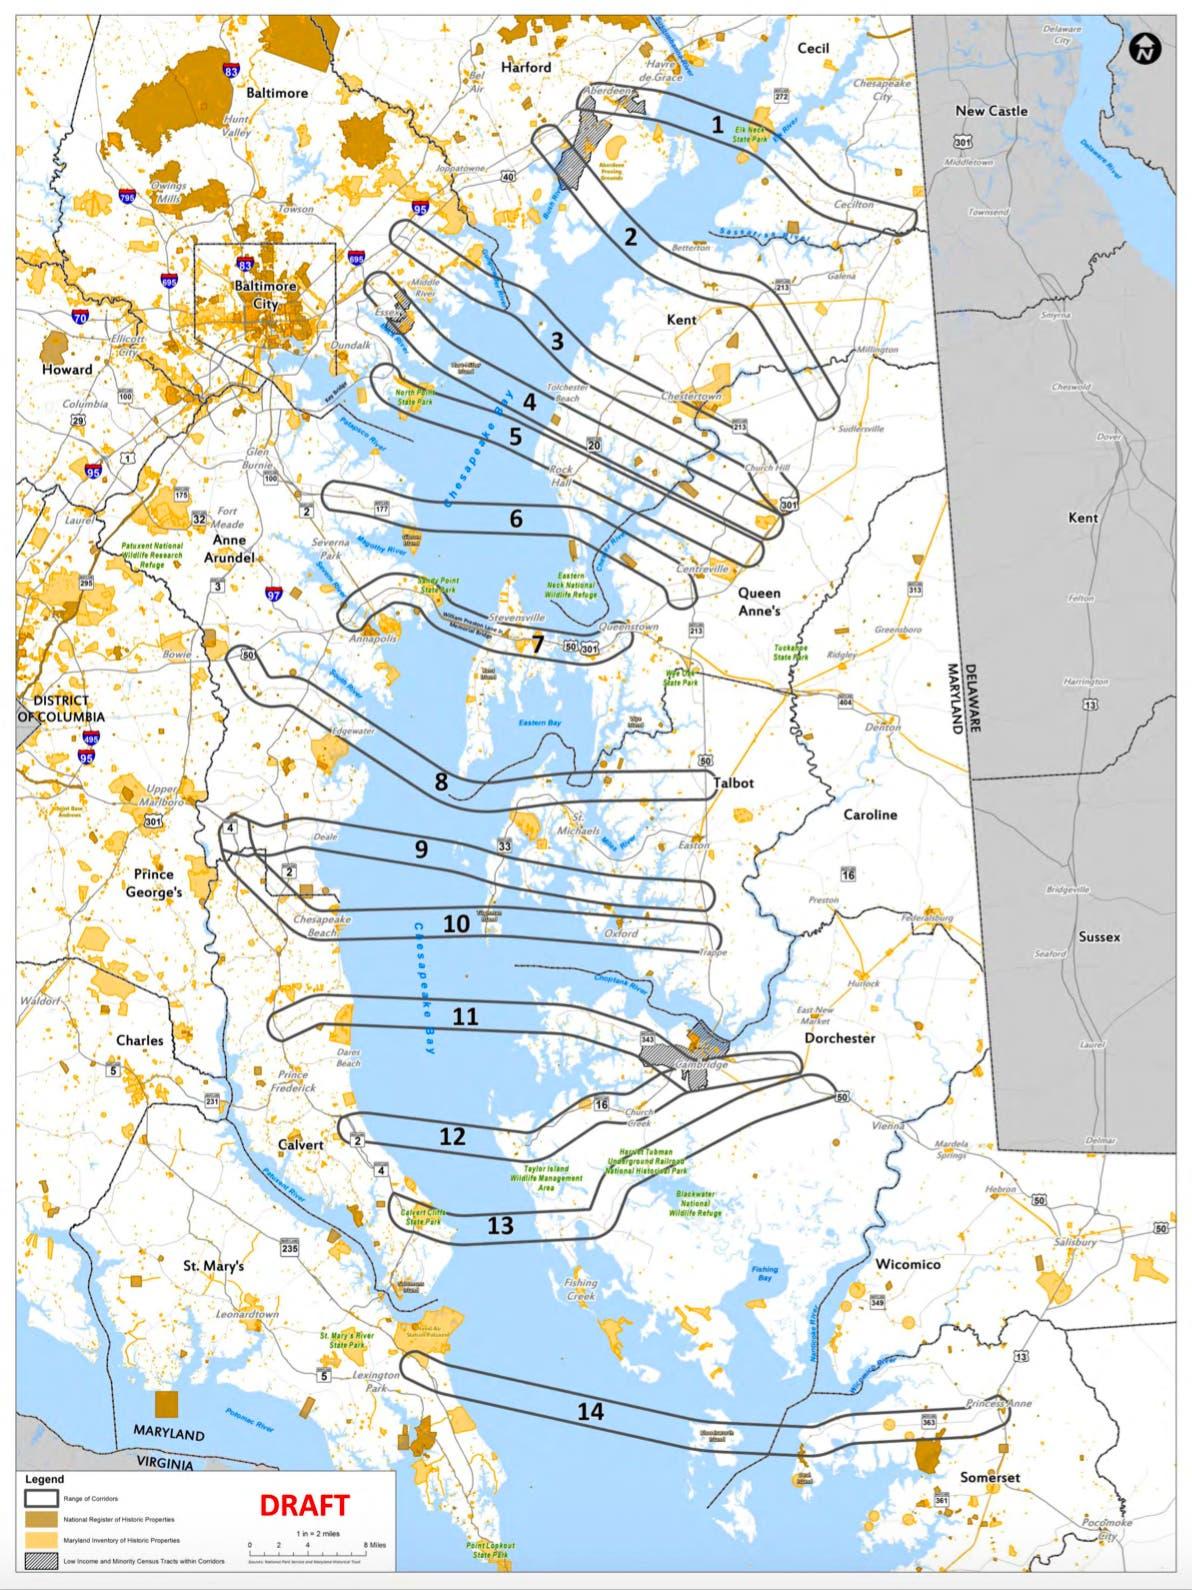 New Chesapeake Bay Bridge Options Provoke Debate | Annapolis, MD Patch